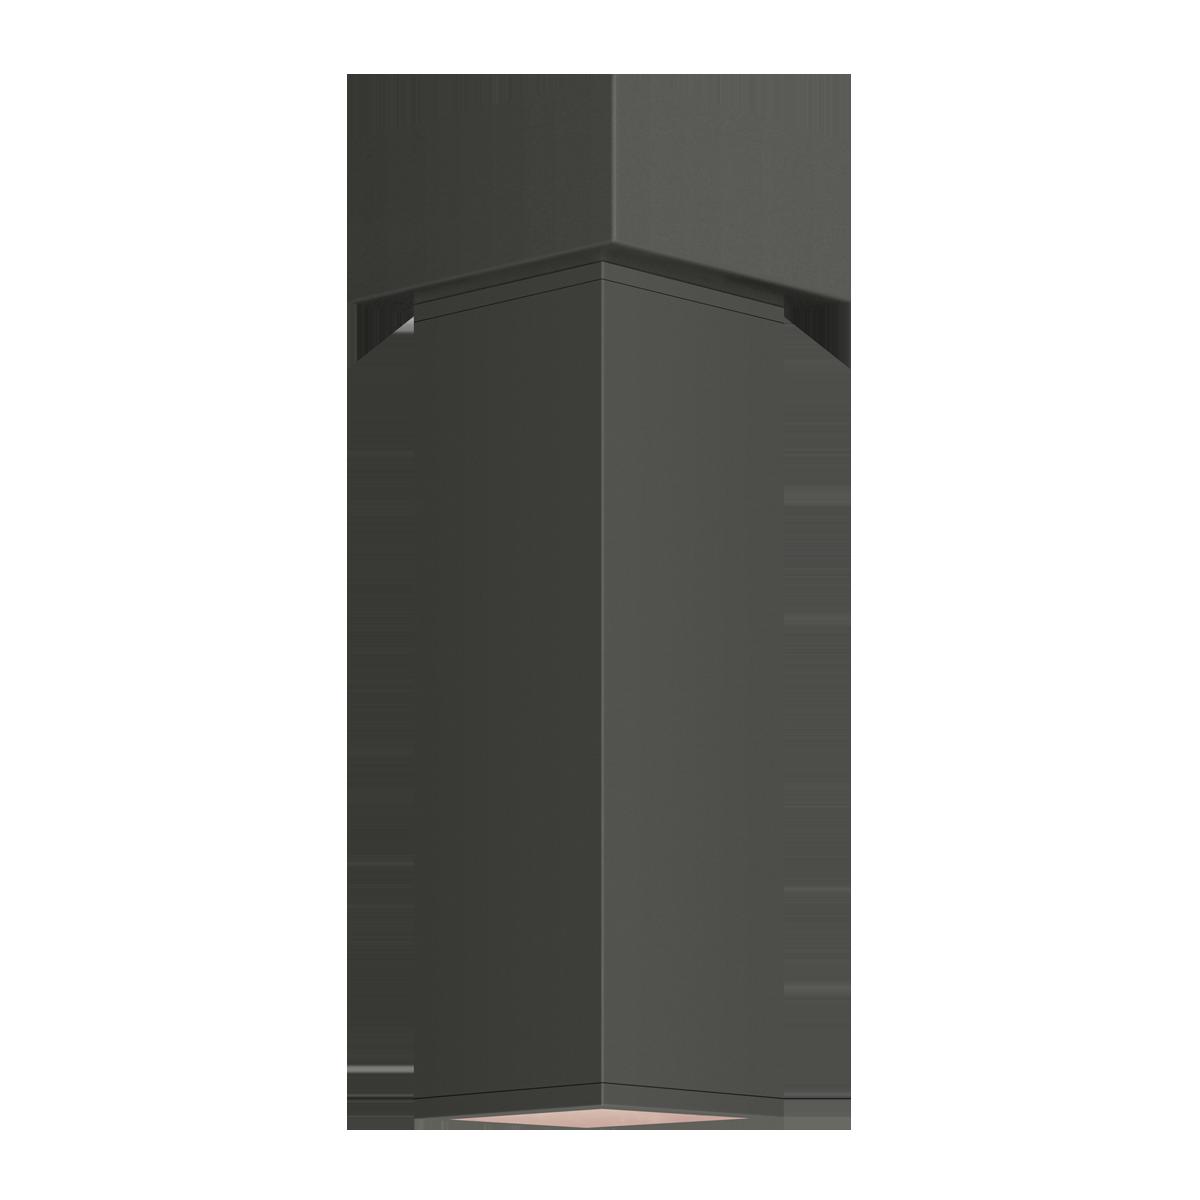 "3"" Square RGBW LED Flush Mount Cylinder"